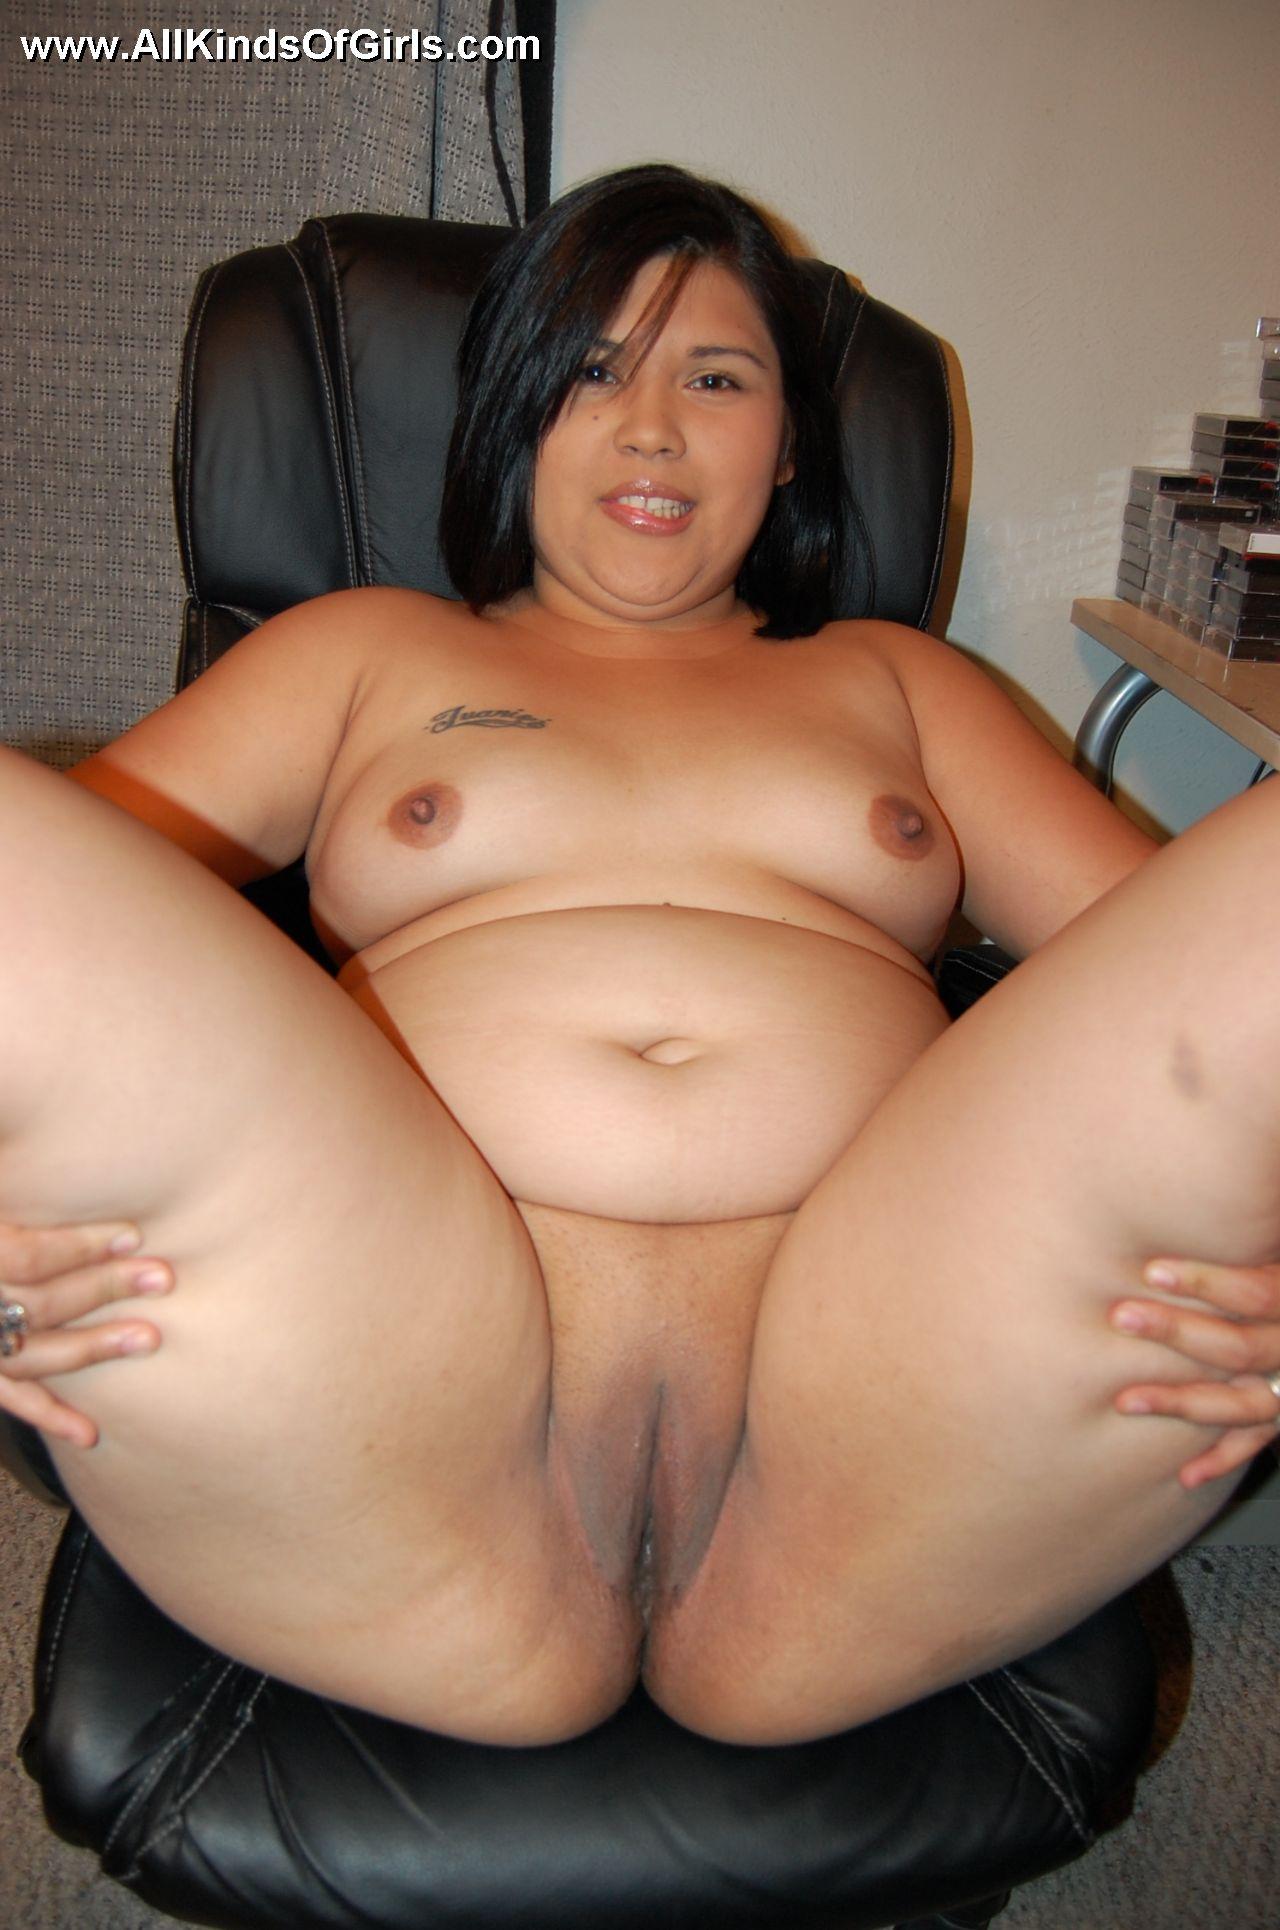 sex women pics asian nude Chubby